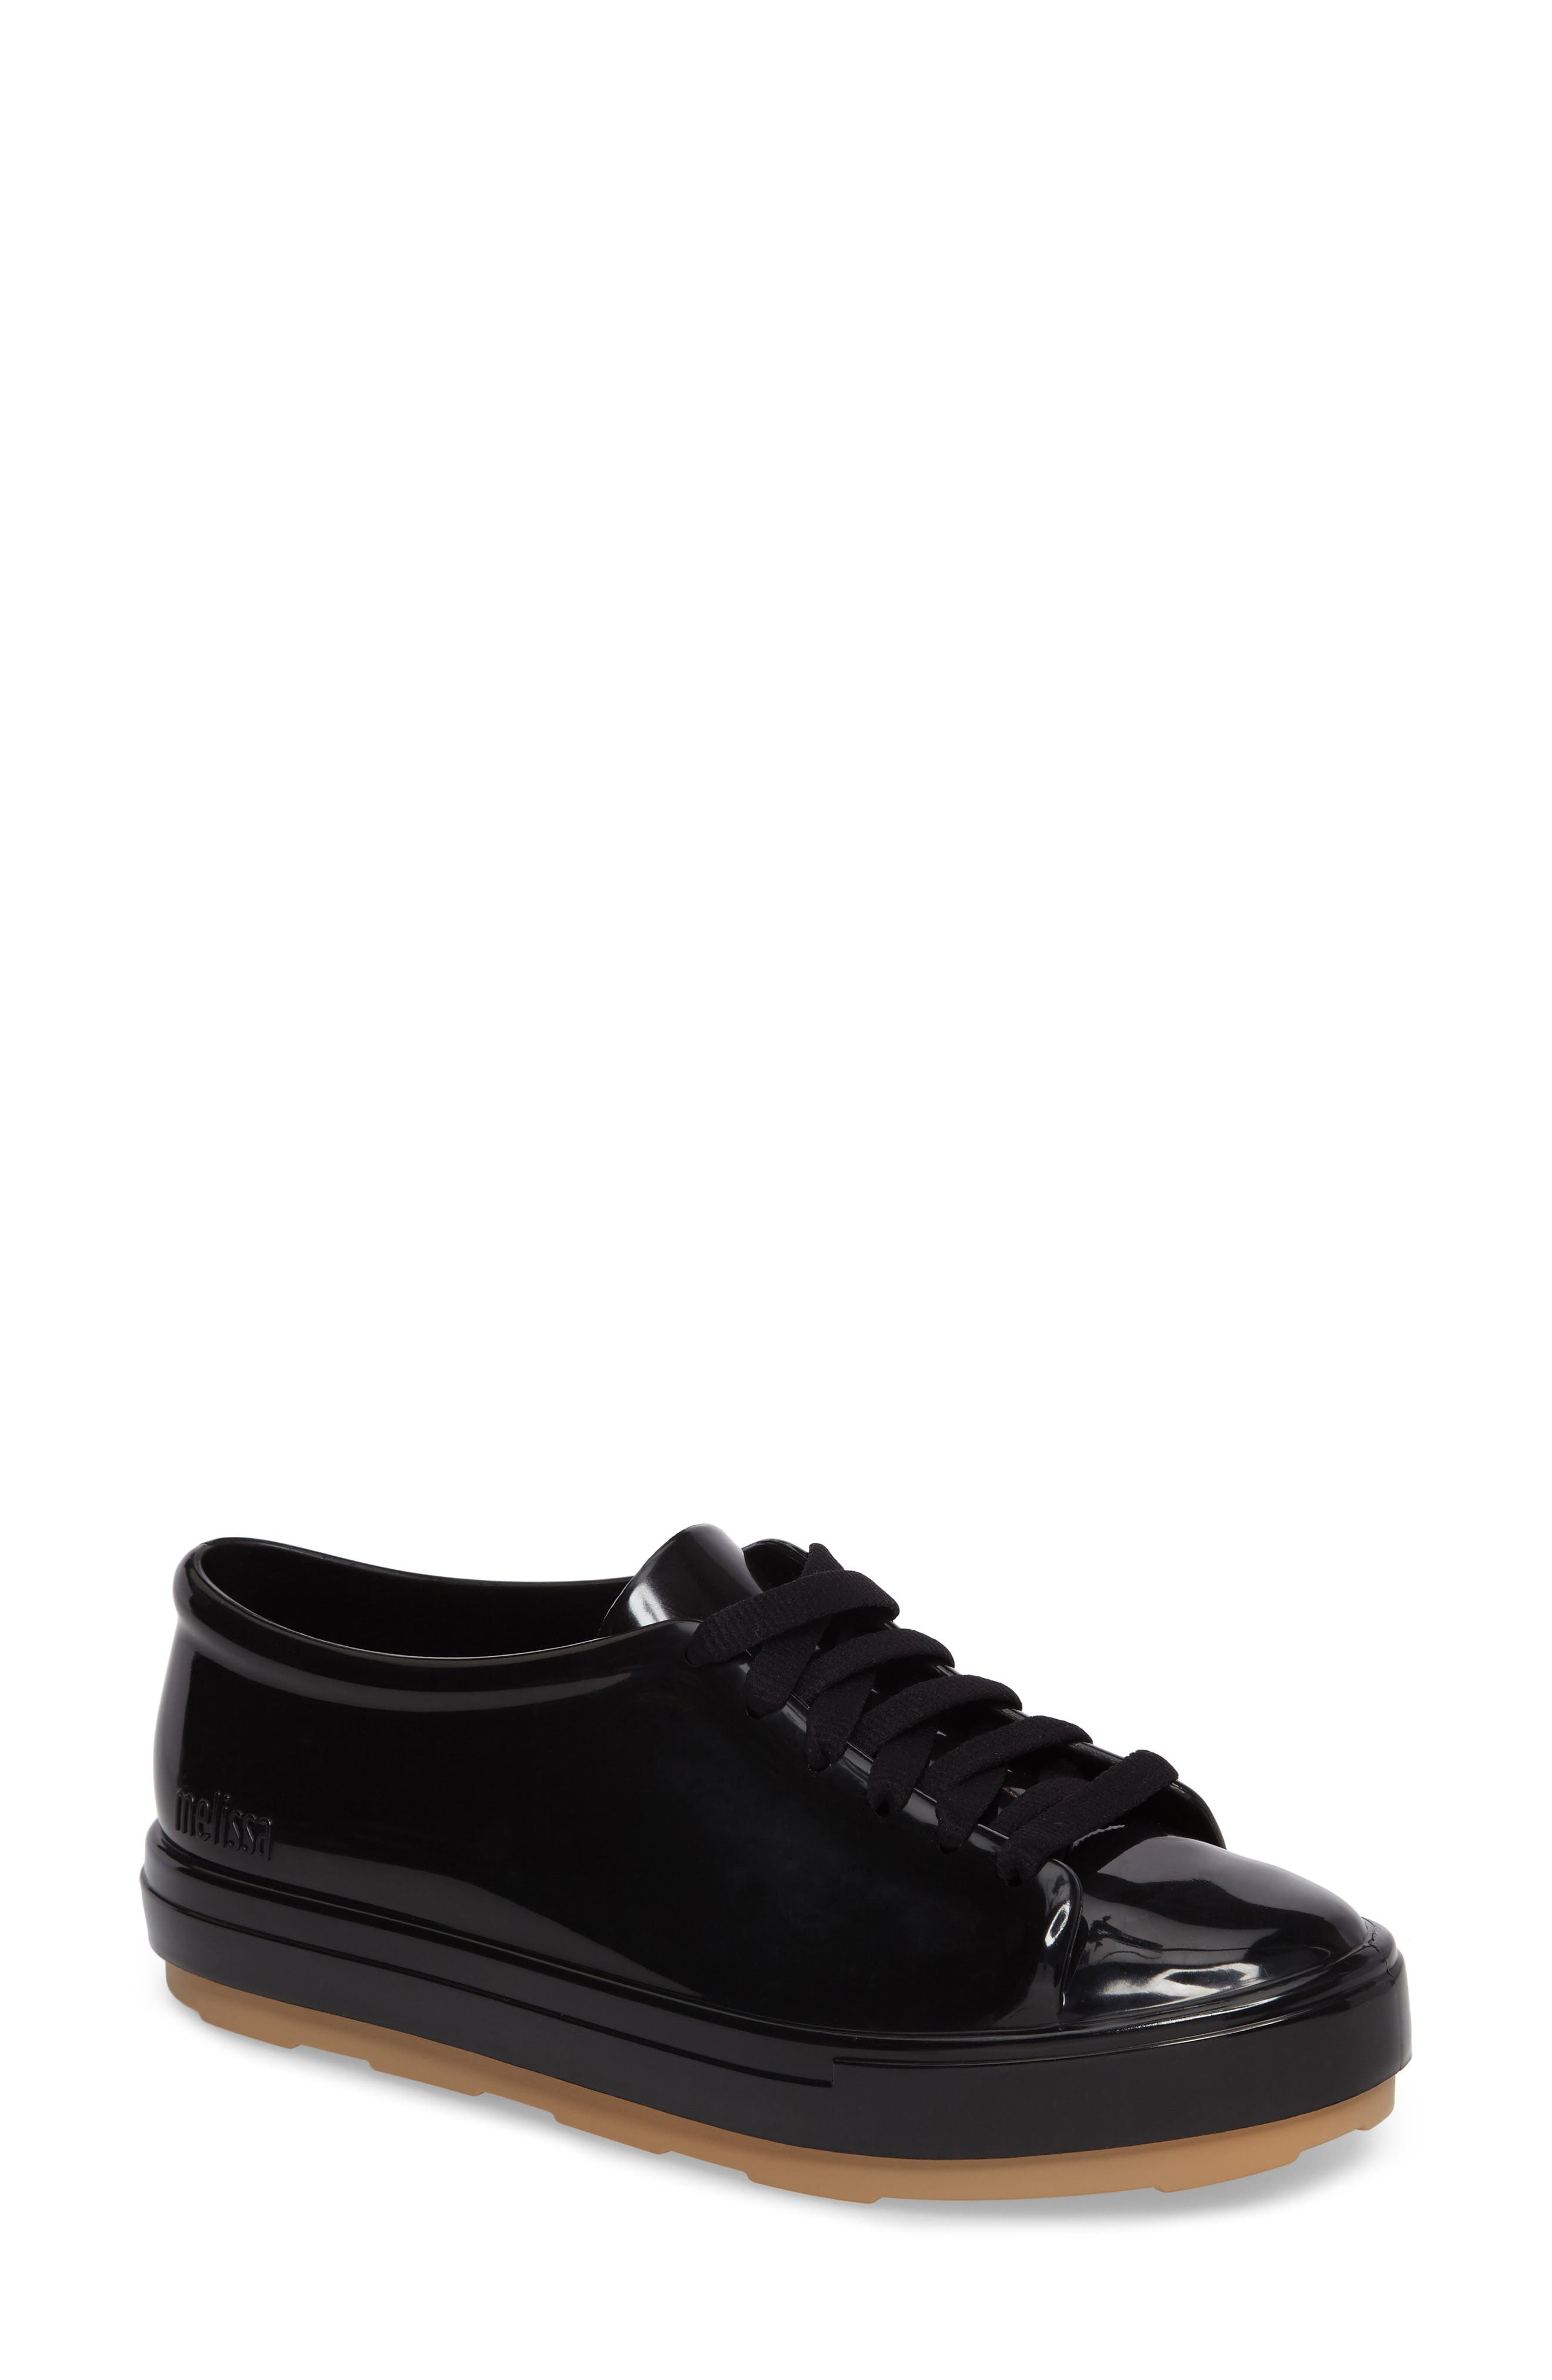 Be Sneaker,                             Main thumbnail 1, color,                             009